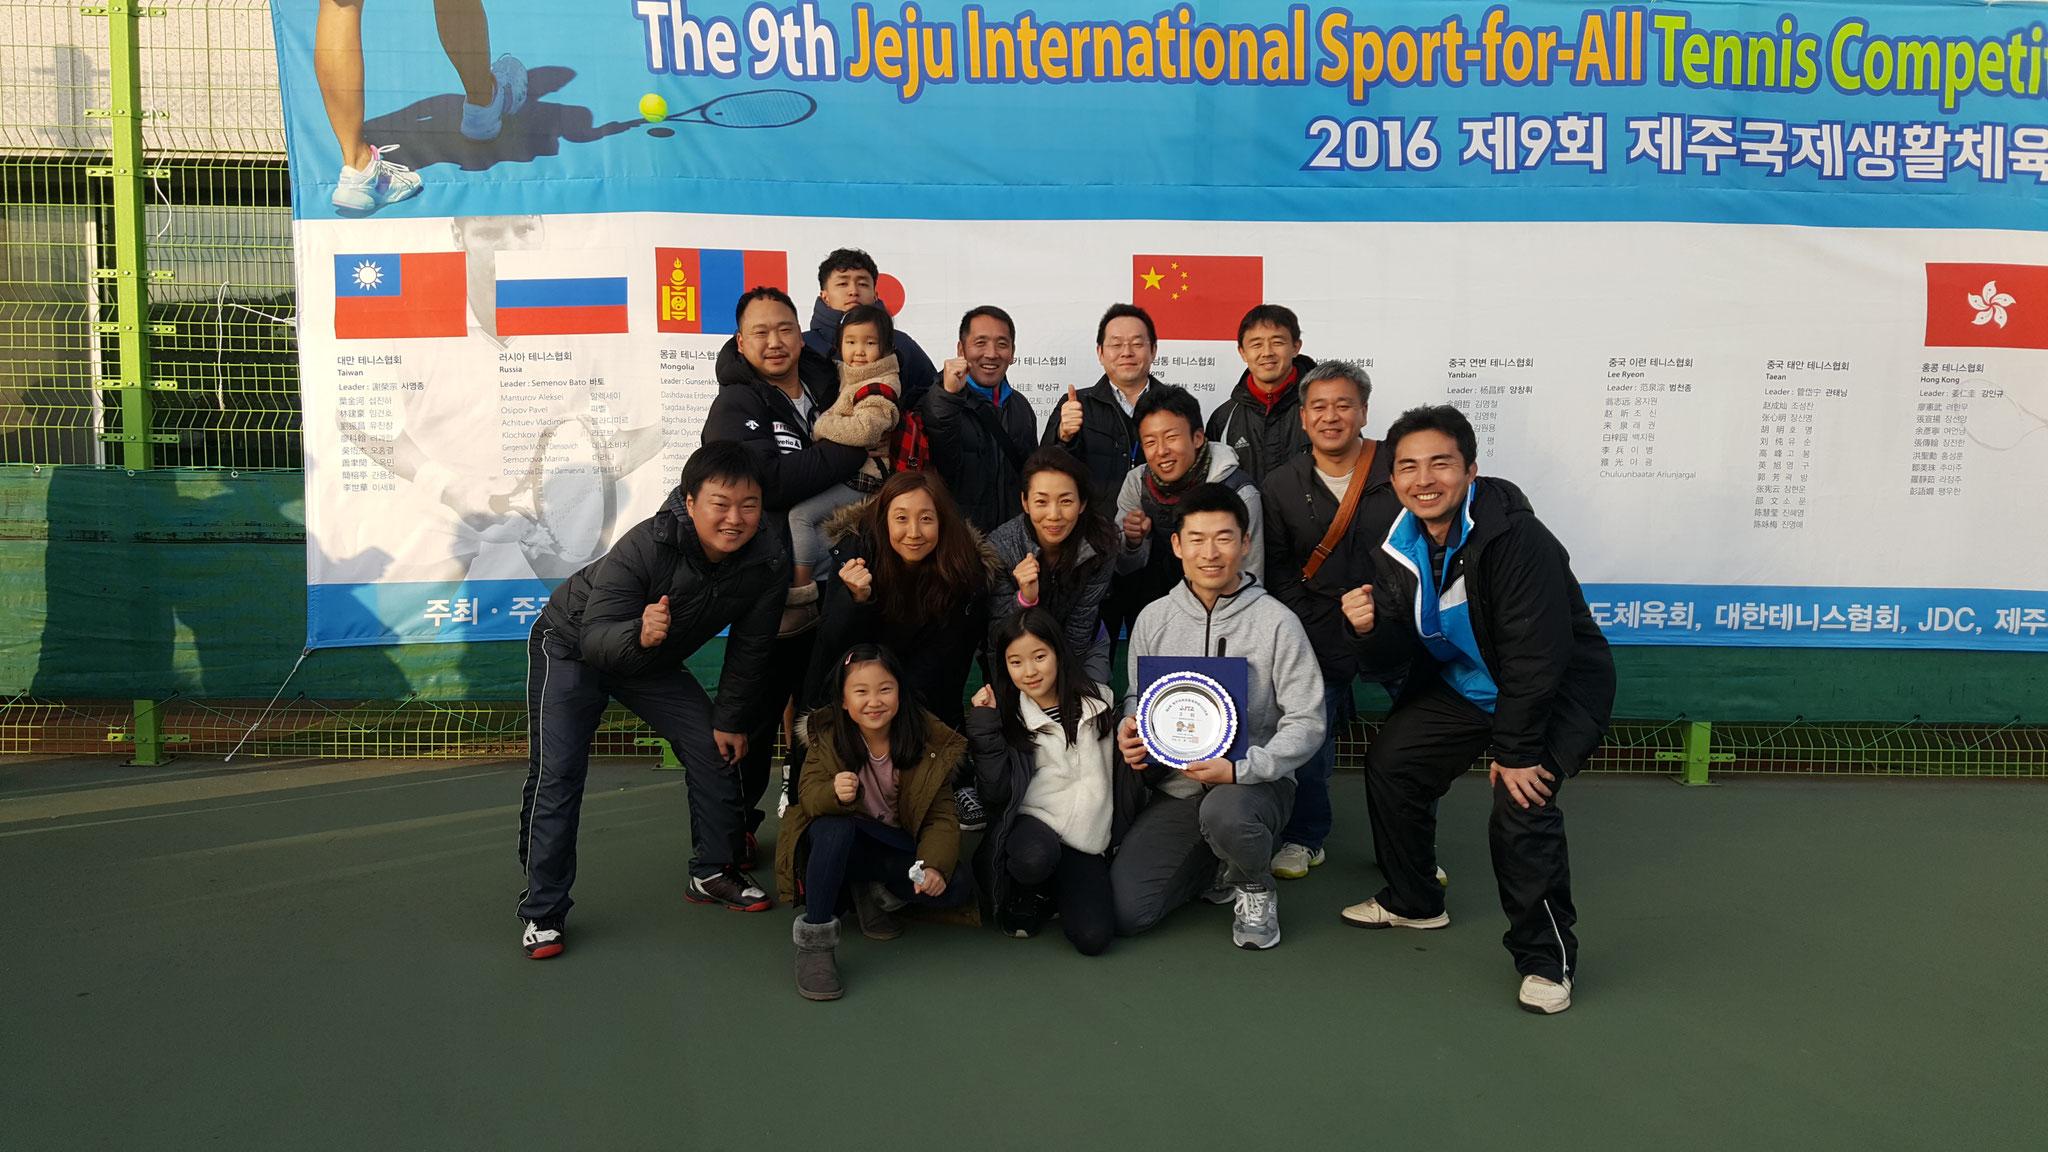 2016年12月 第9回 済州国際生活体育テニス大会 参加者